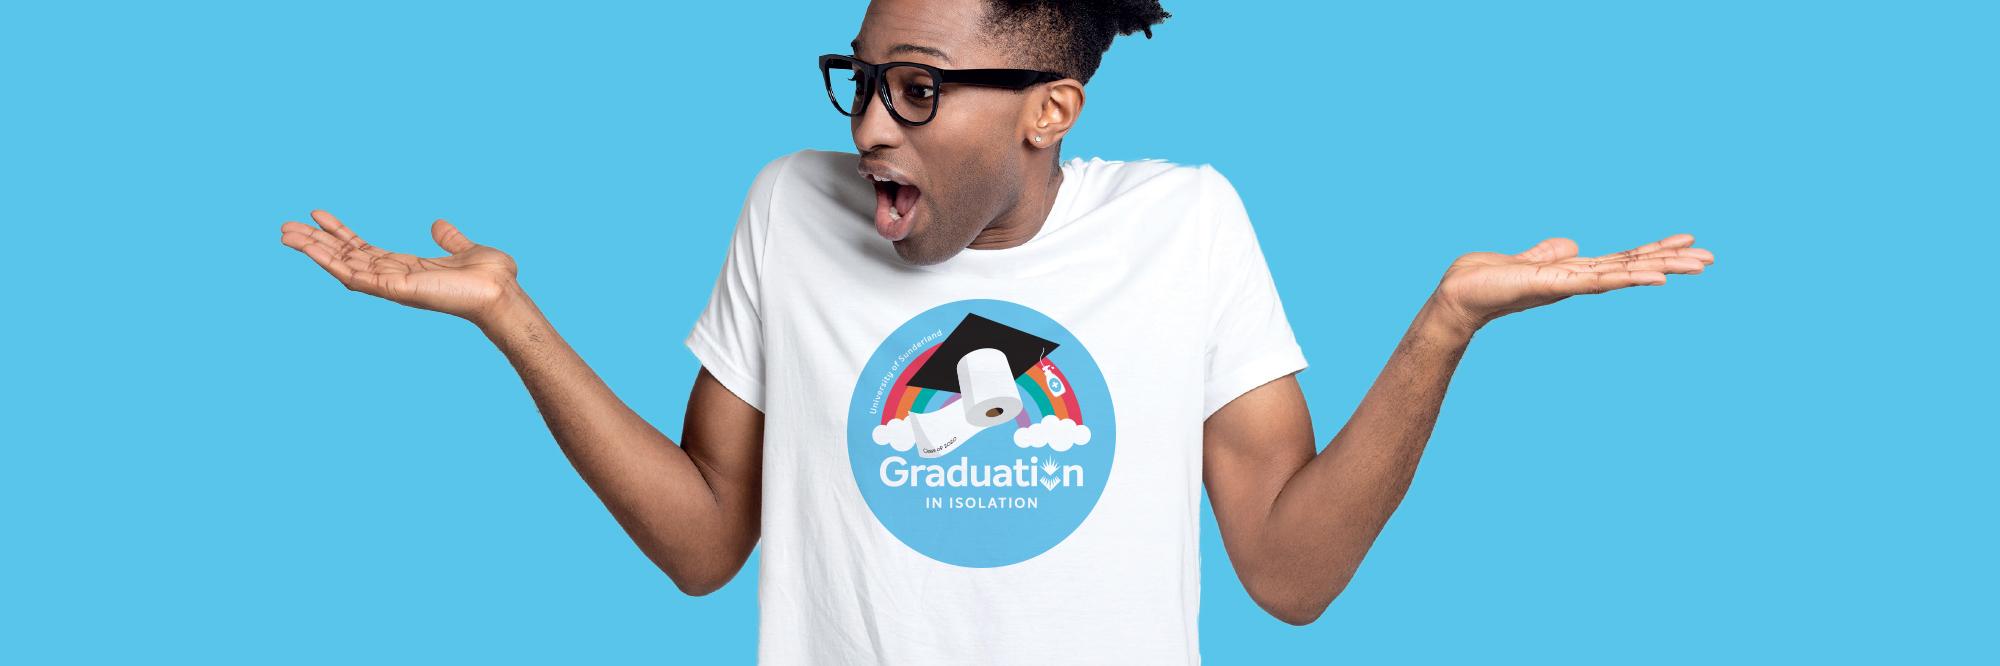 Main web banner graduation in isolation merchandise